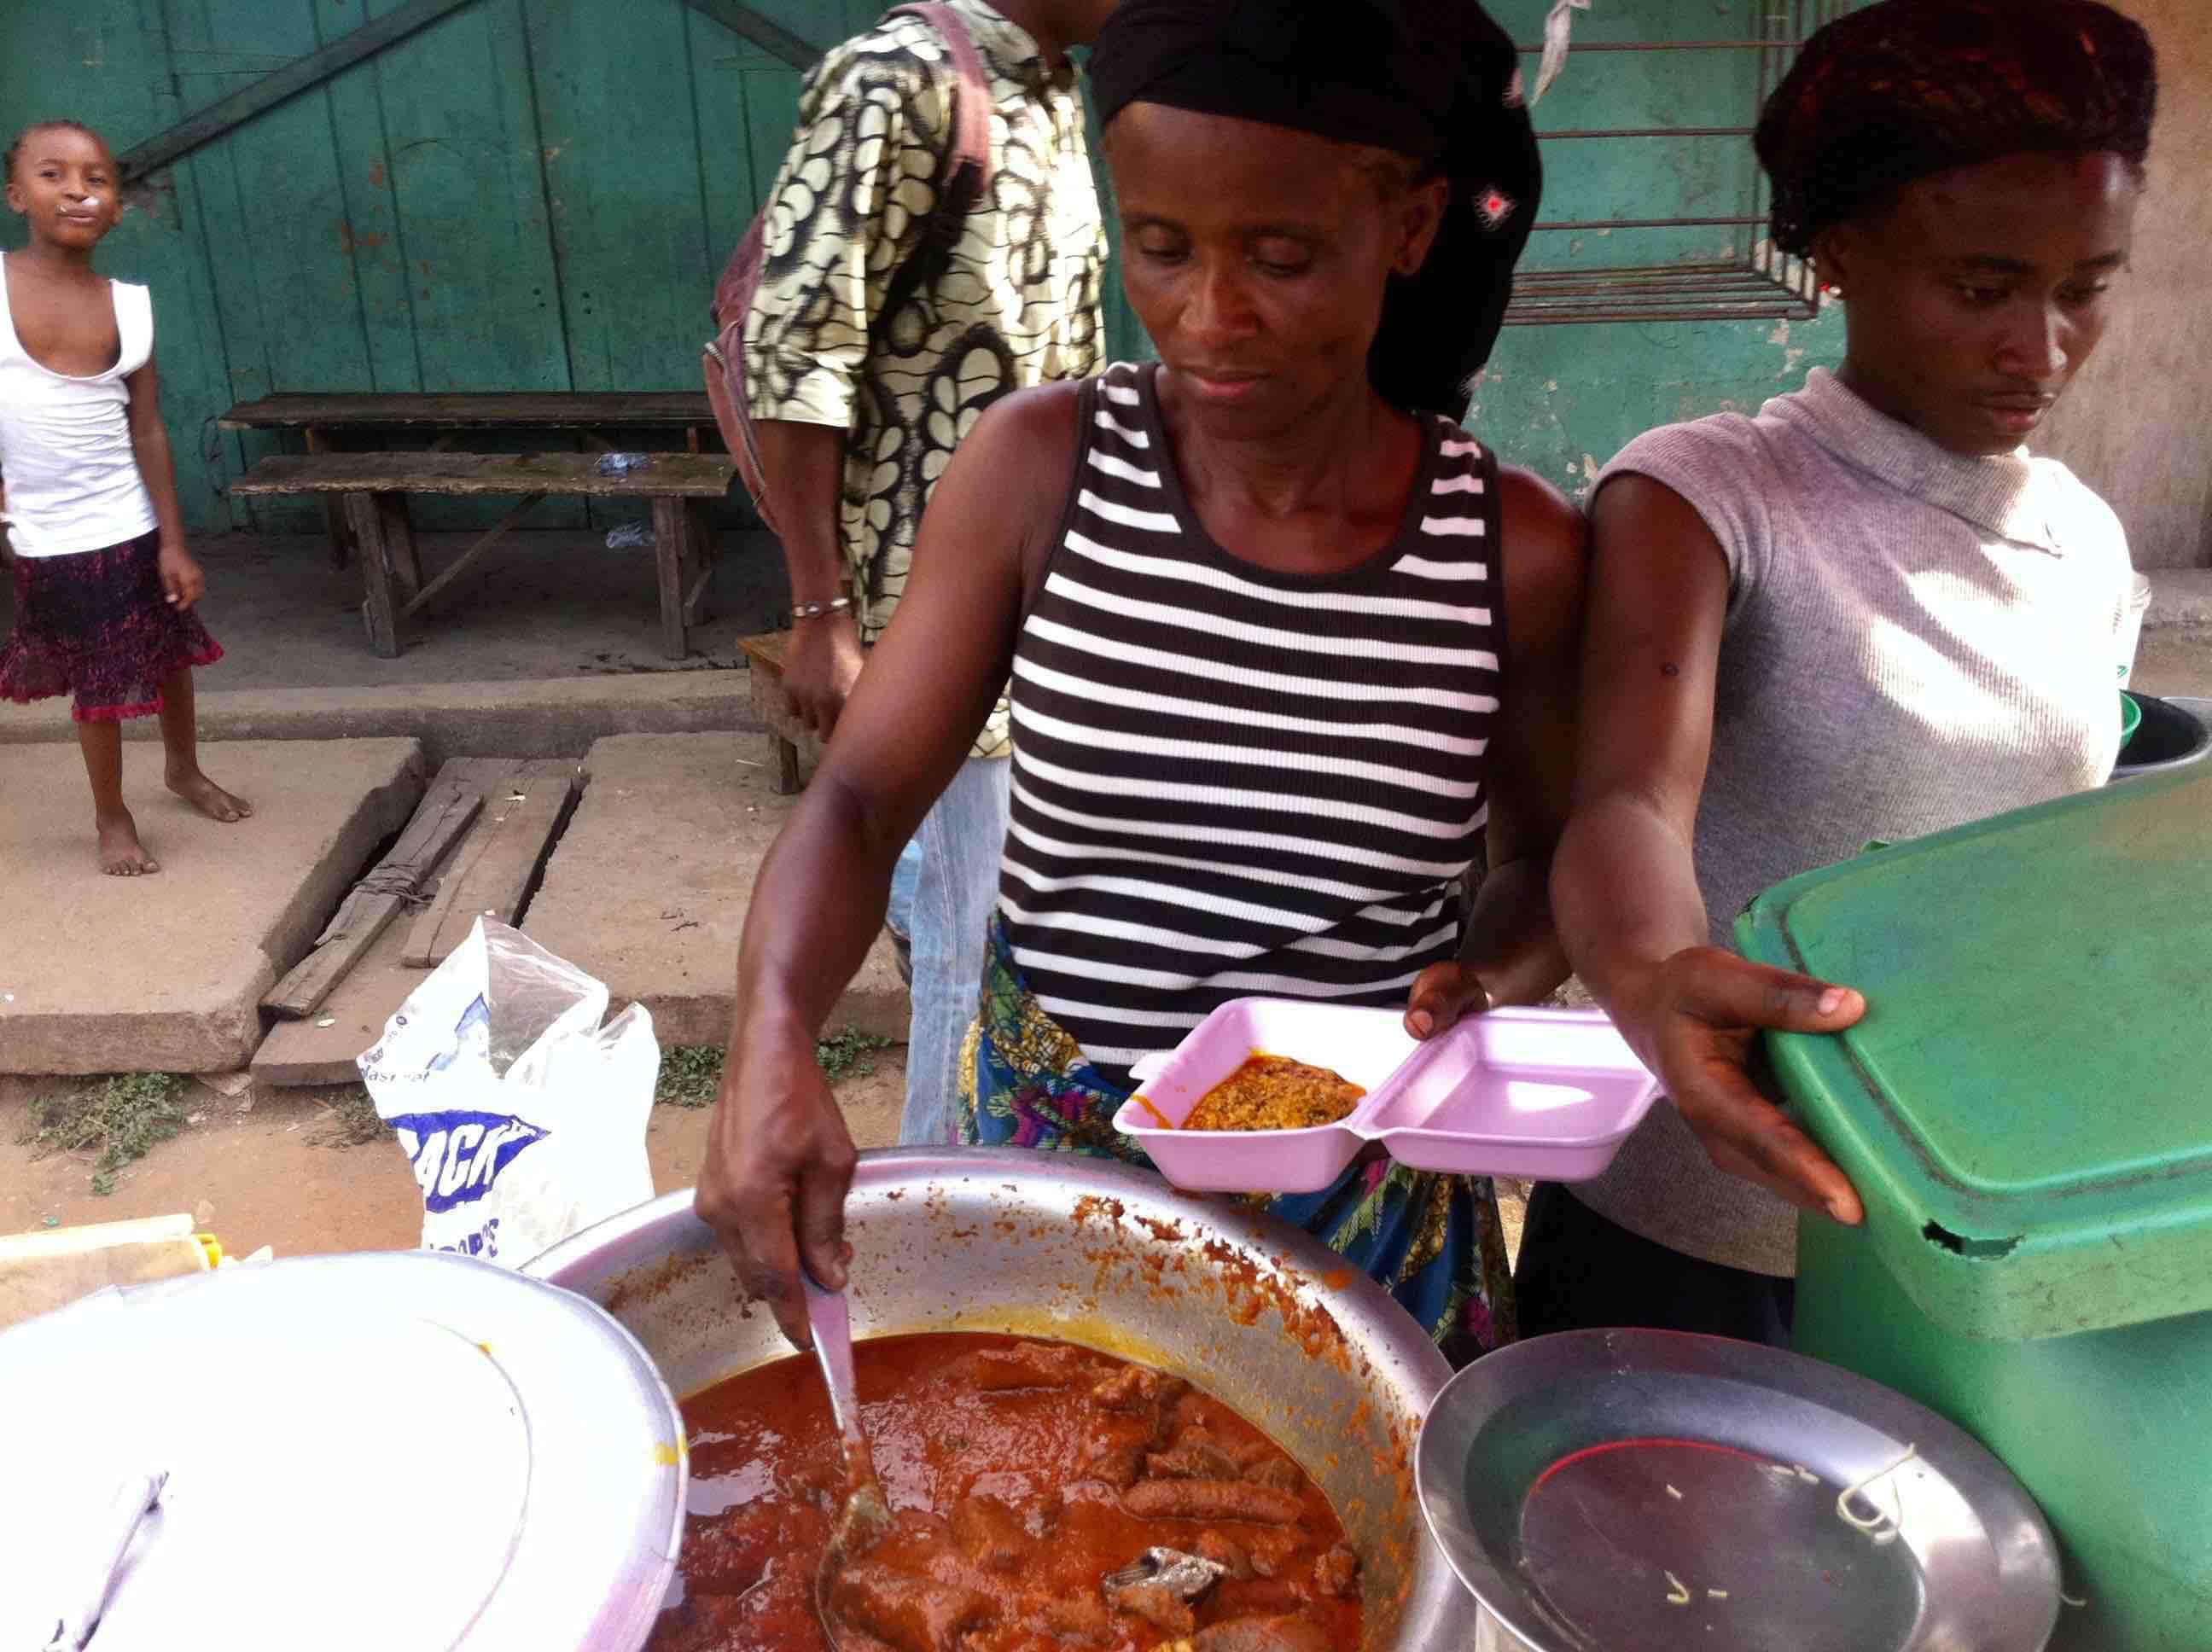 Serving Street Food, Osborne Road, Lagos Island, Nigeria. #JujuFilms